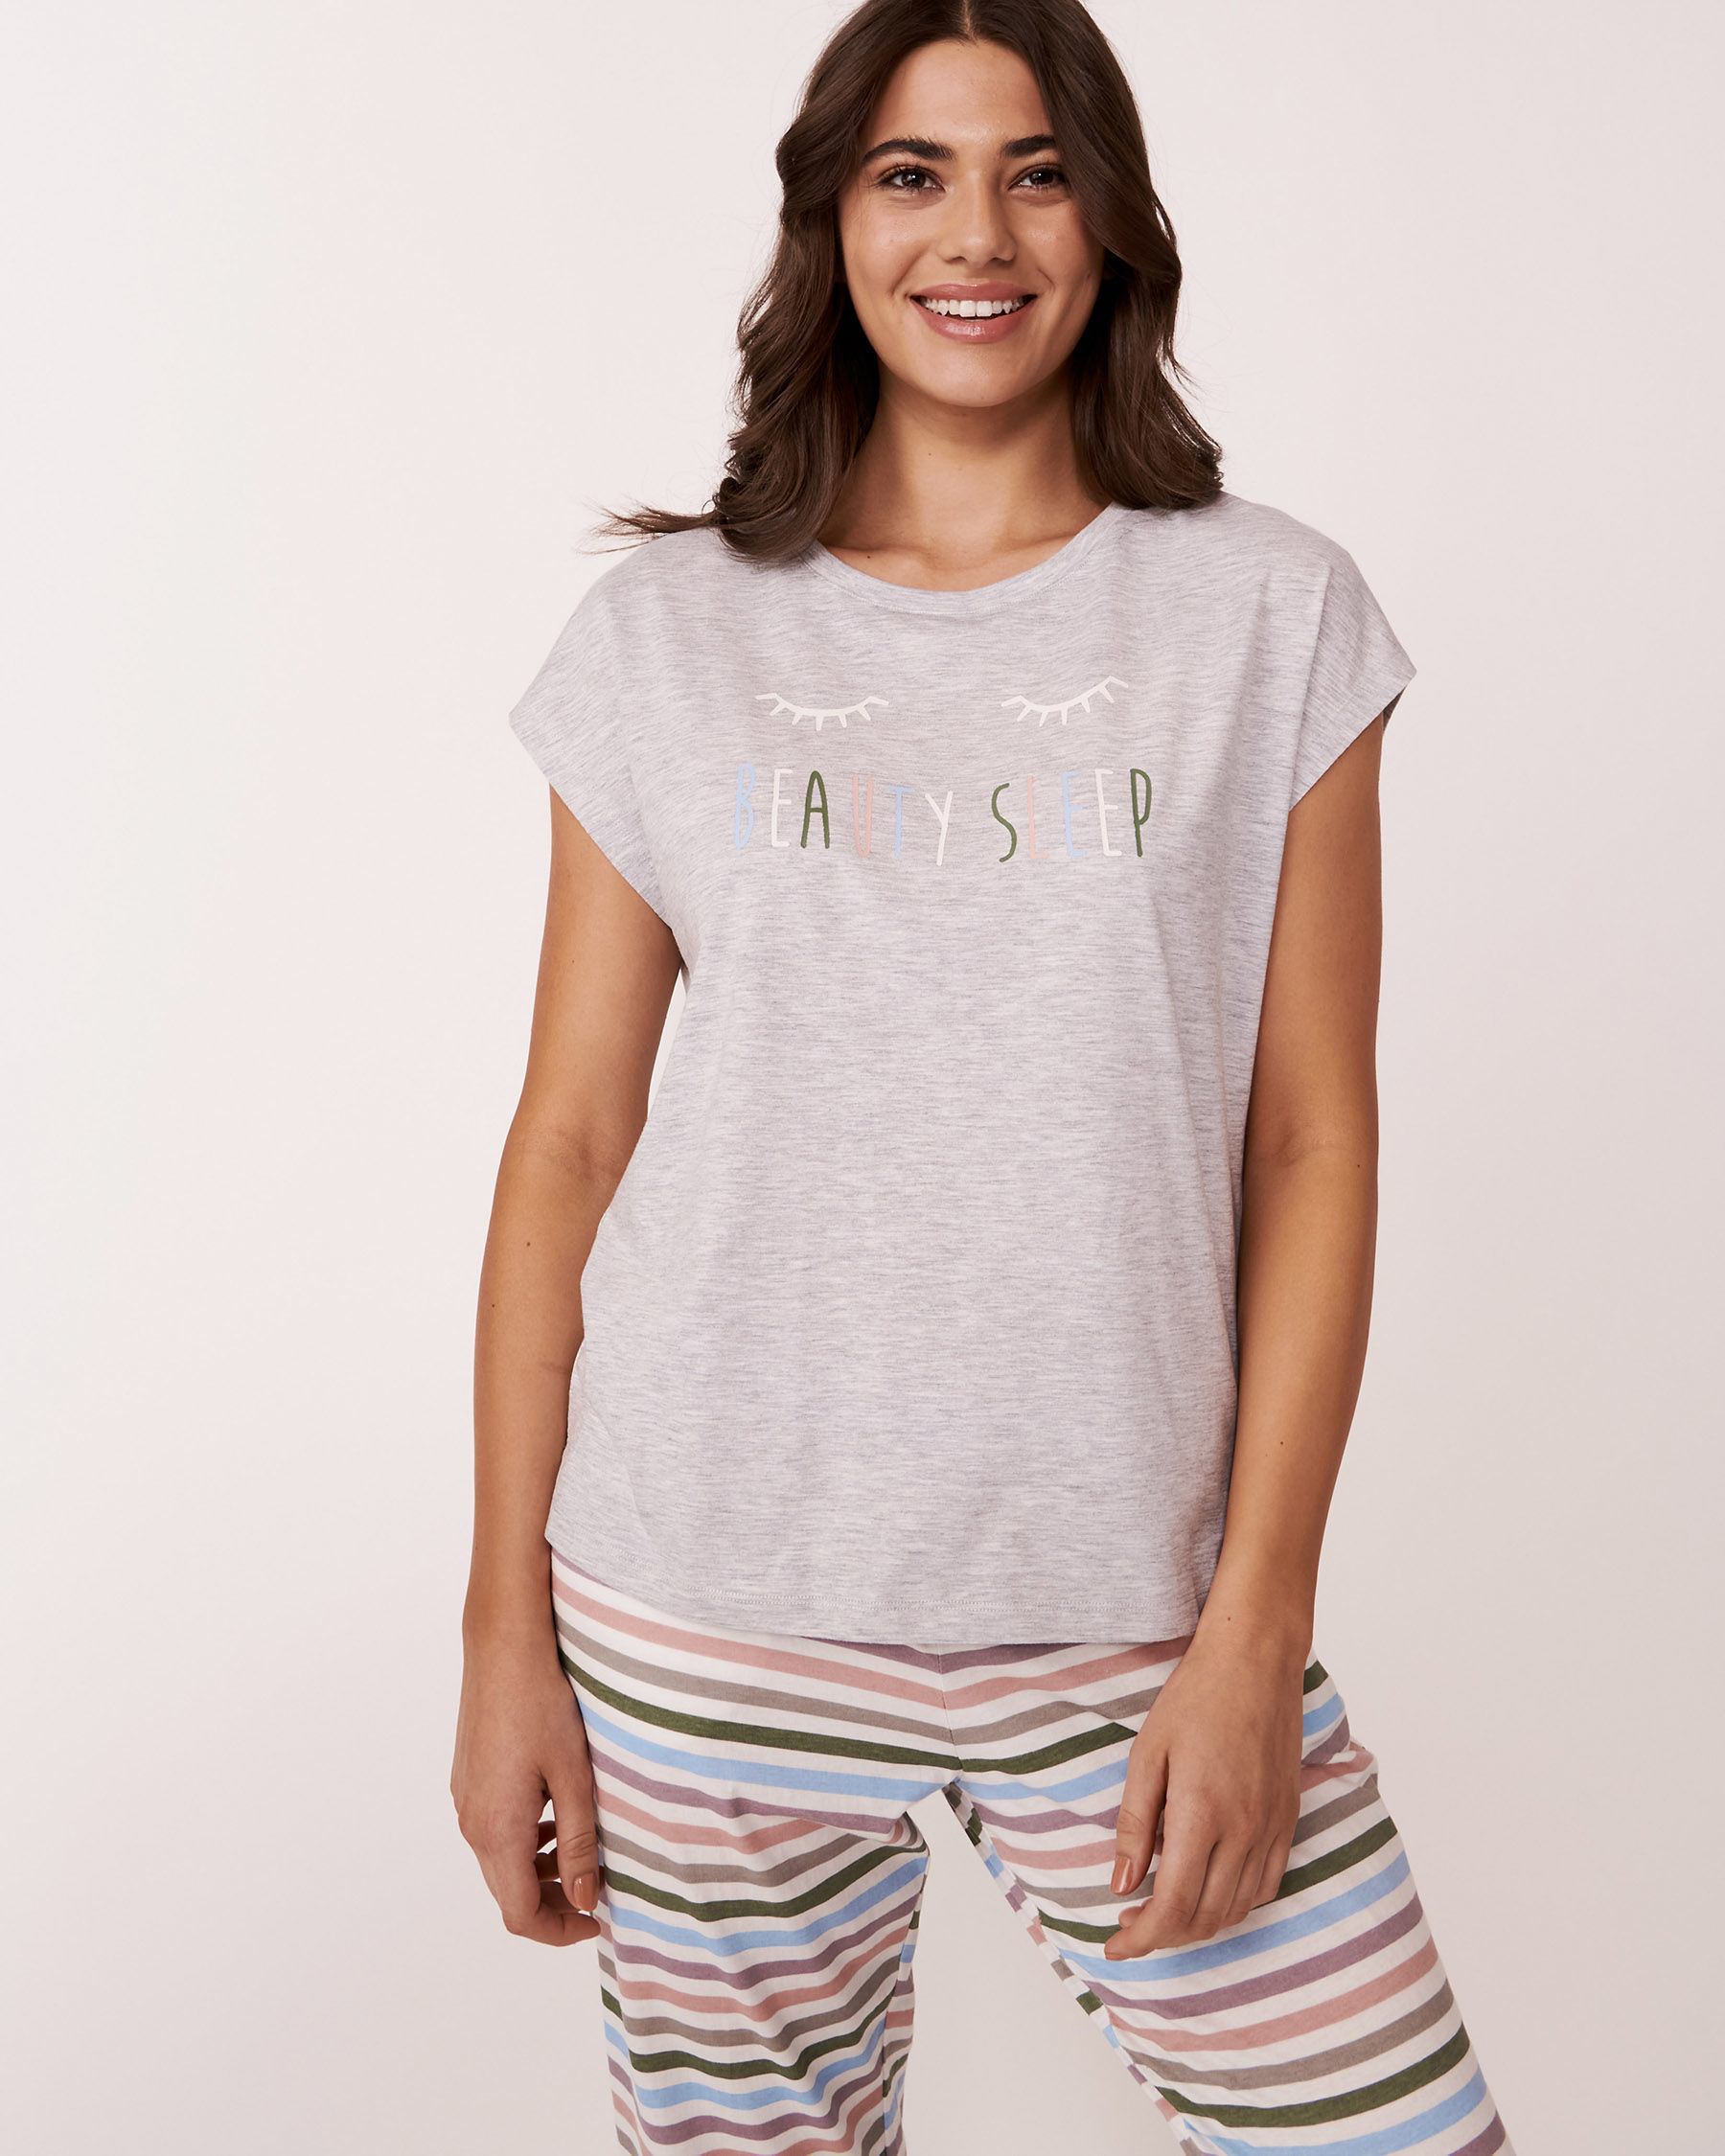 LA VIE EN ROSE Crew Neck T-shirt Grey 880-386-0-11 - View1